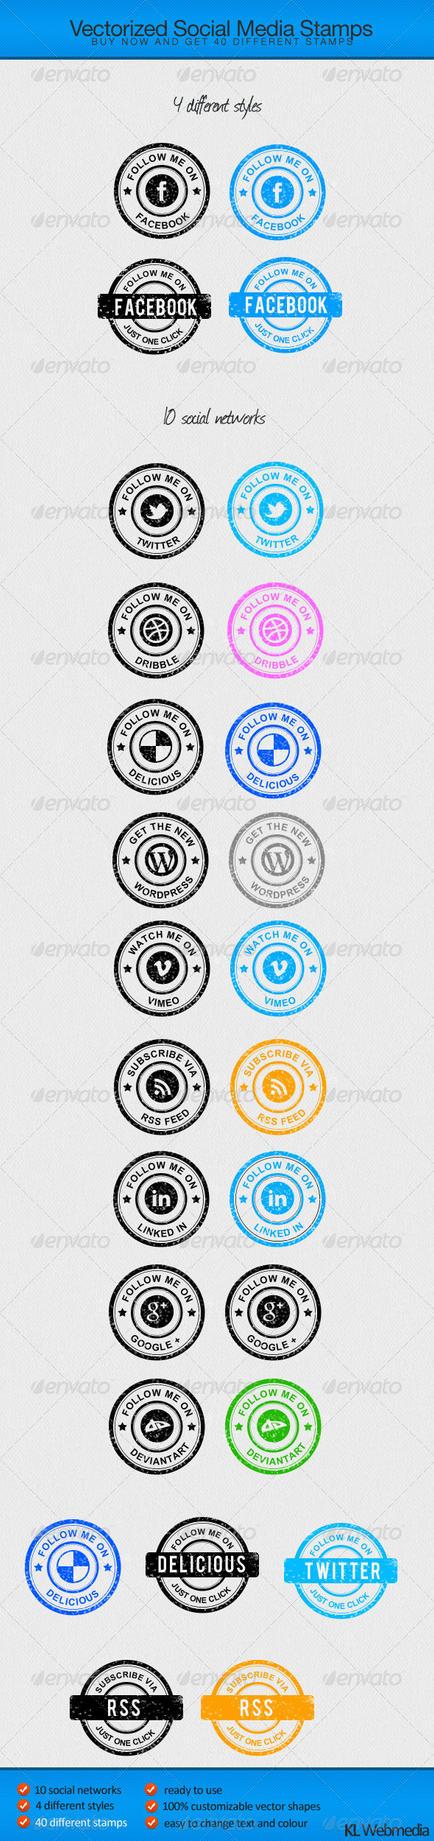 40 Social Media Stamps by KL-Webmedia